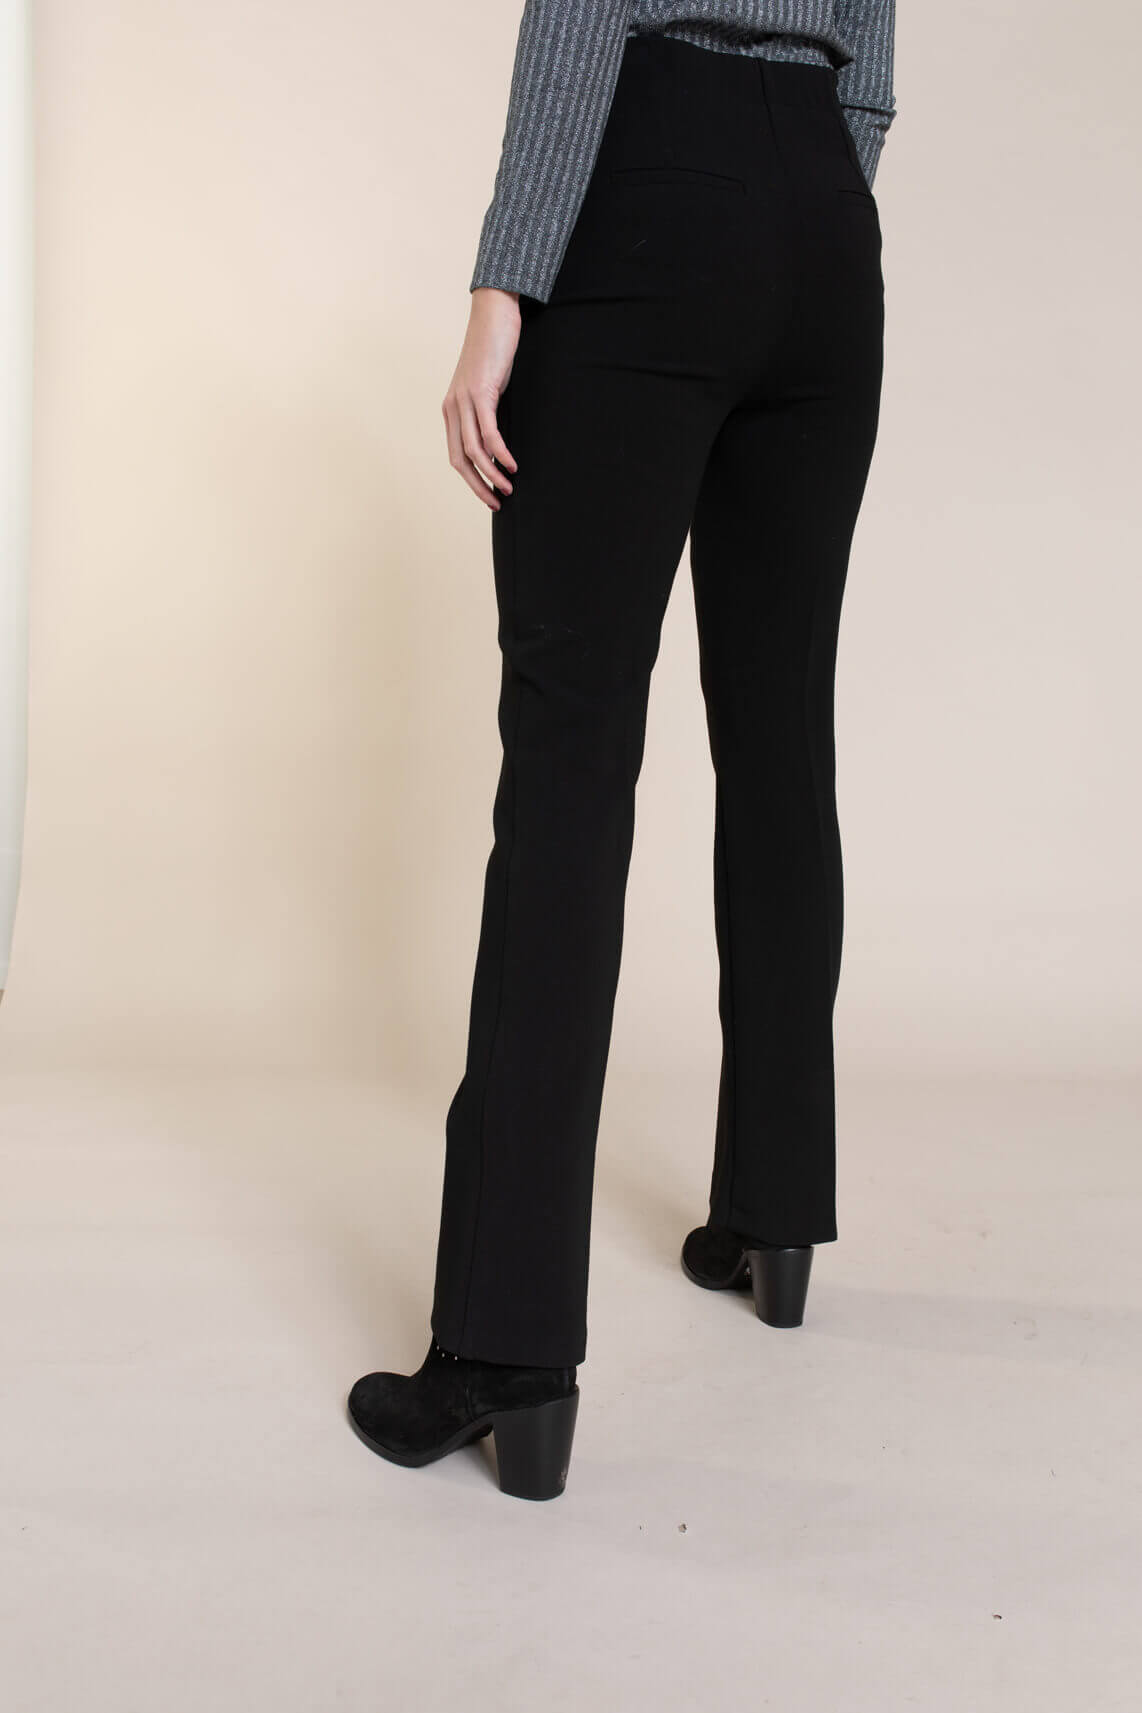 Anna Dames Pantalon met knopen zwart